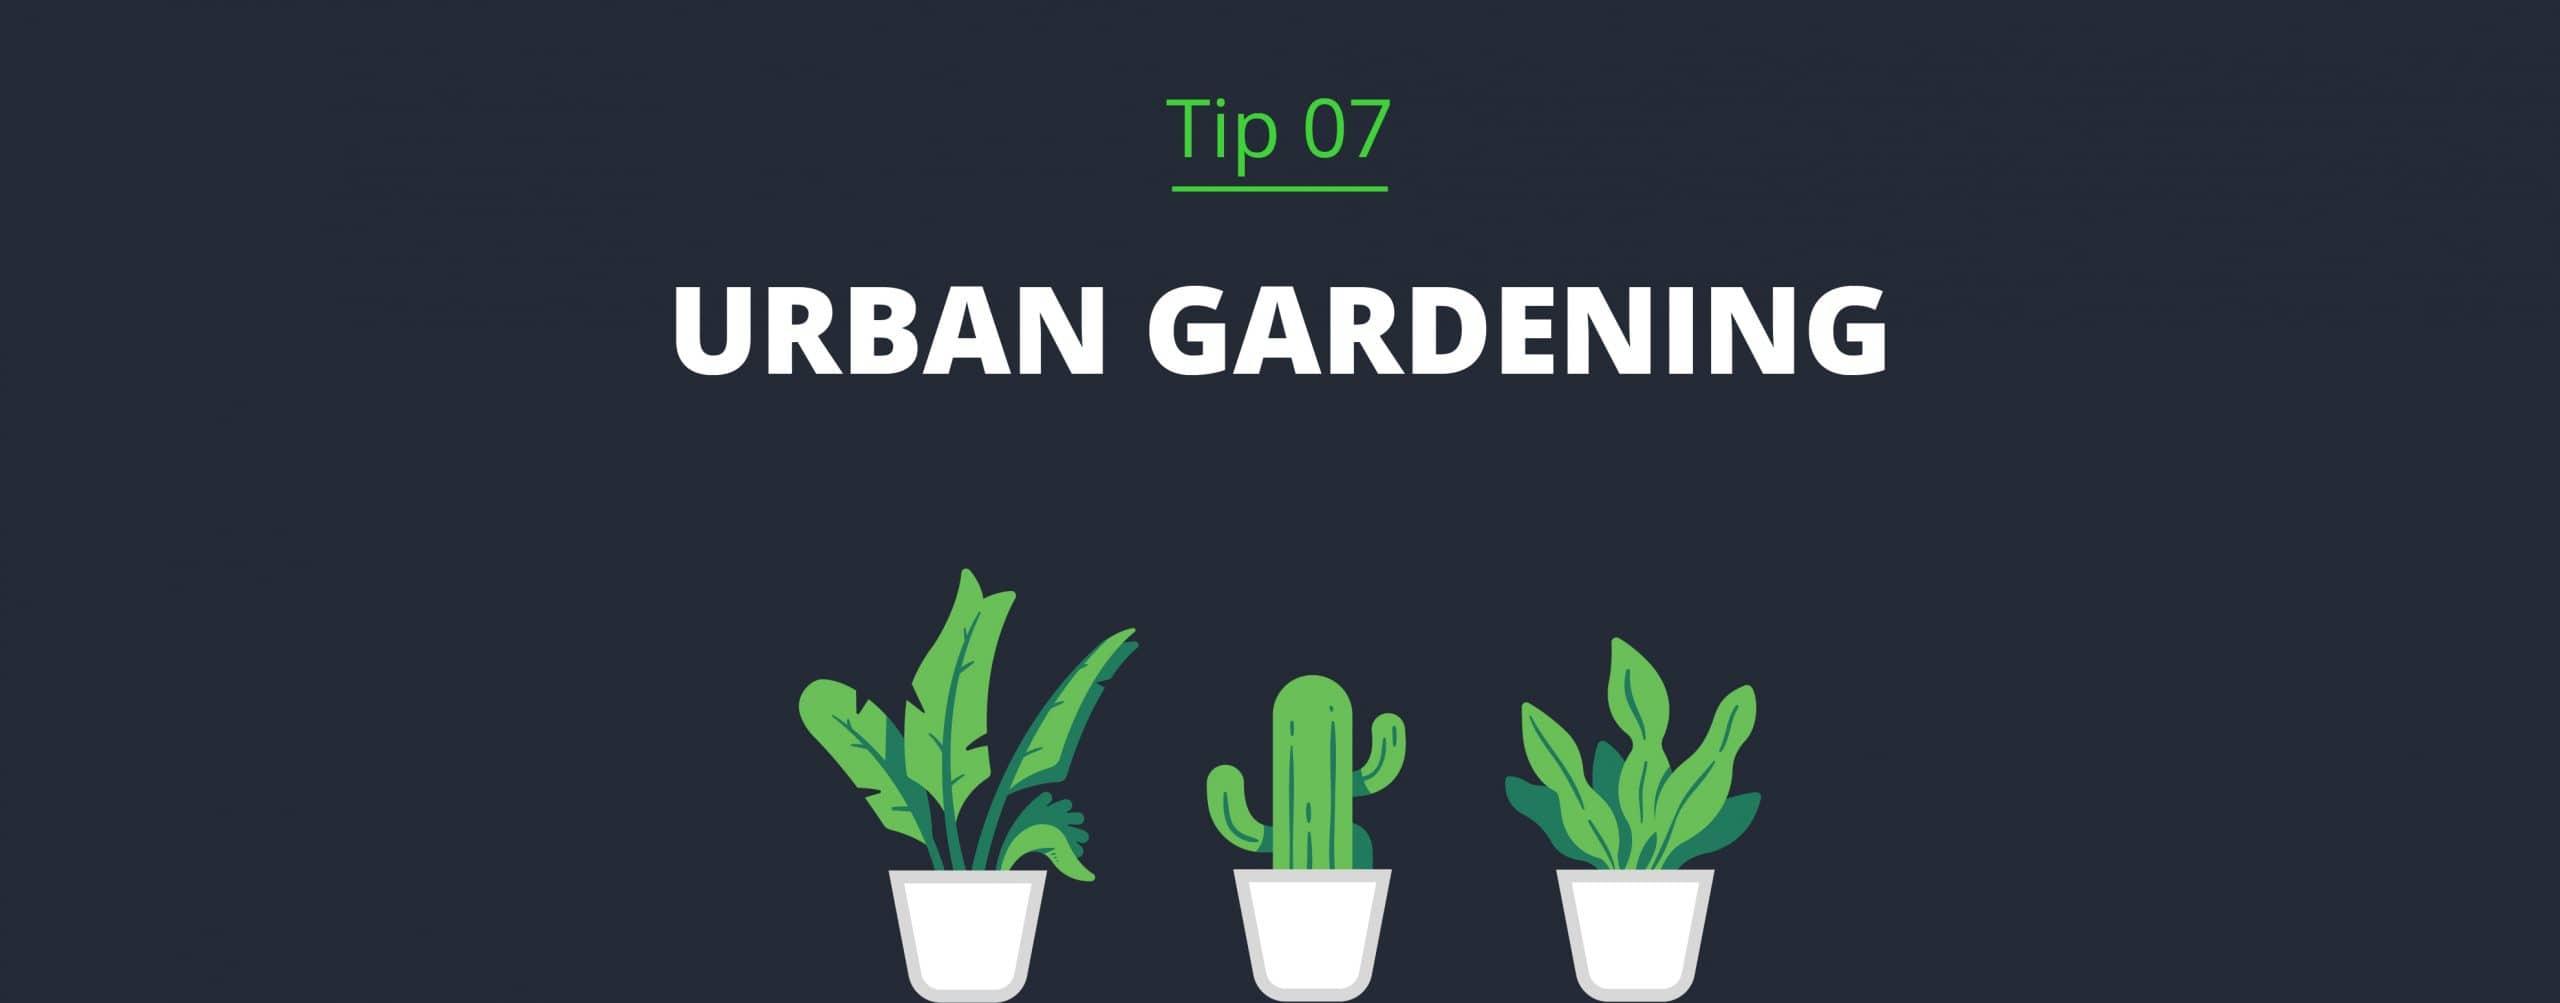 Arb Garden Guide Headings-07